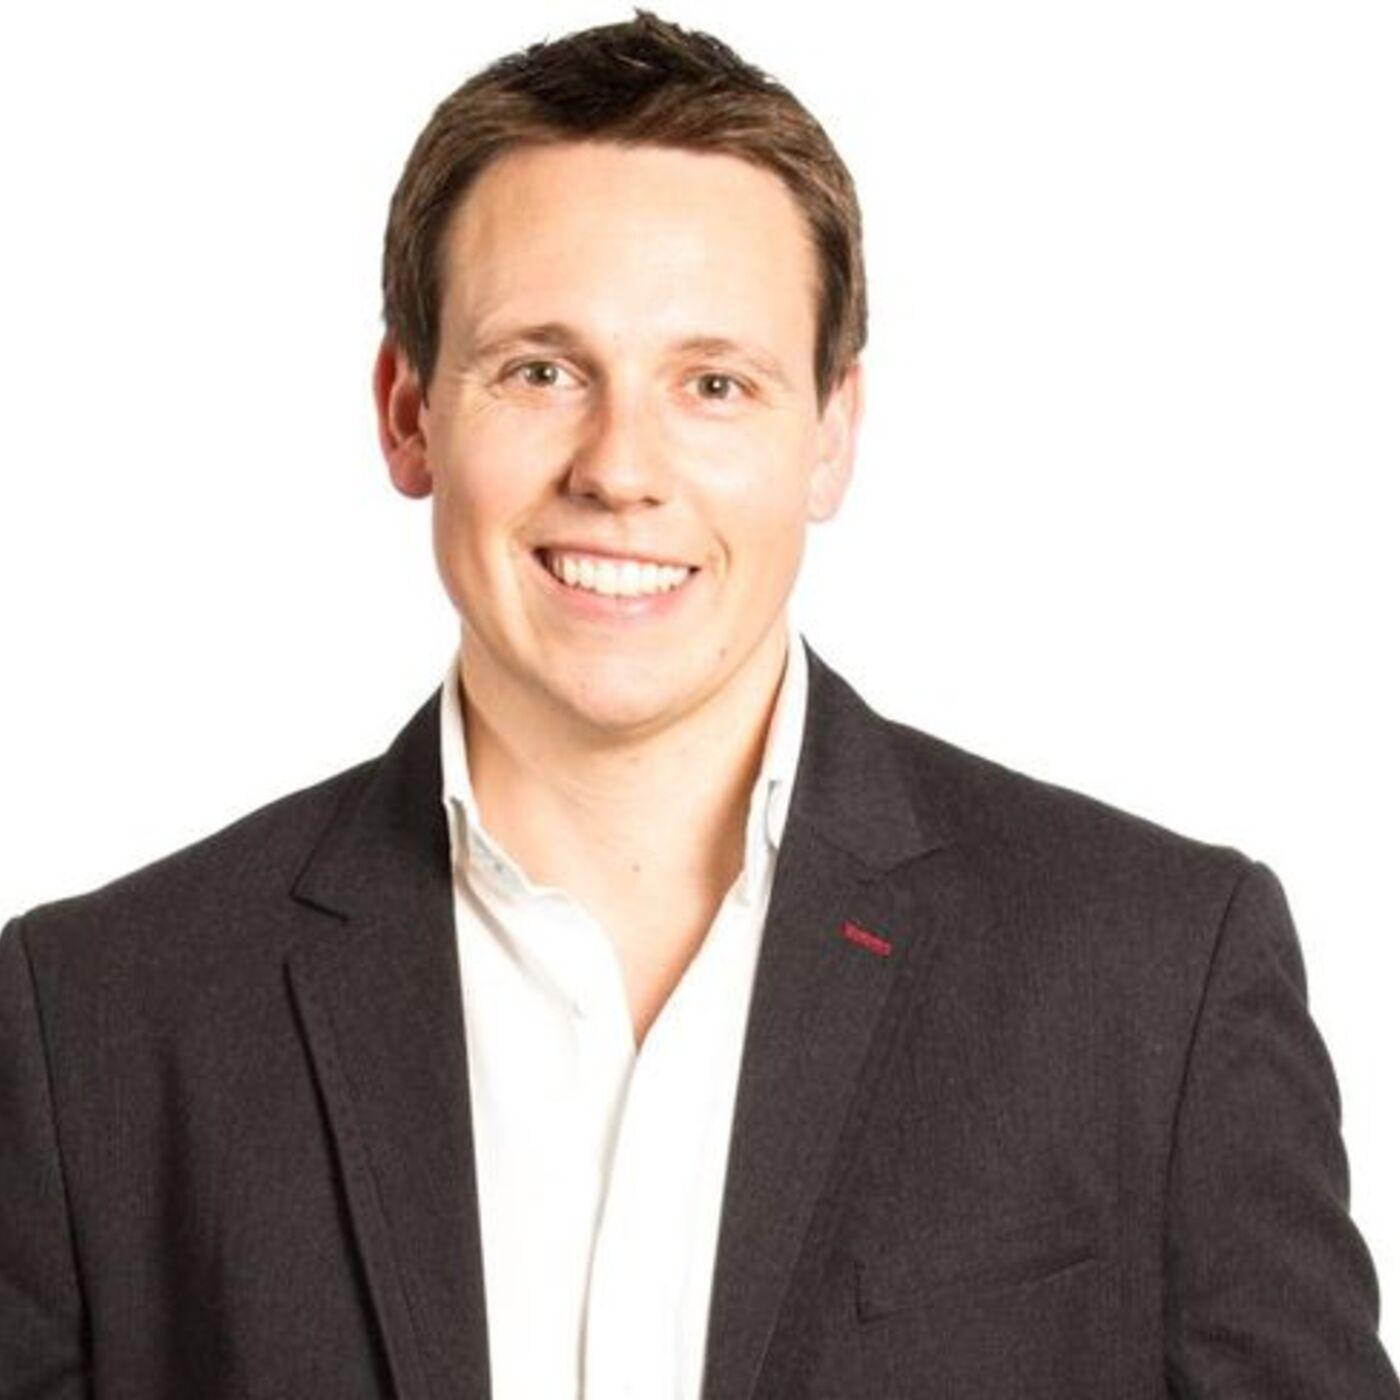 Charlie Wade | UK Managing Director, VTS